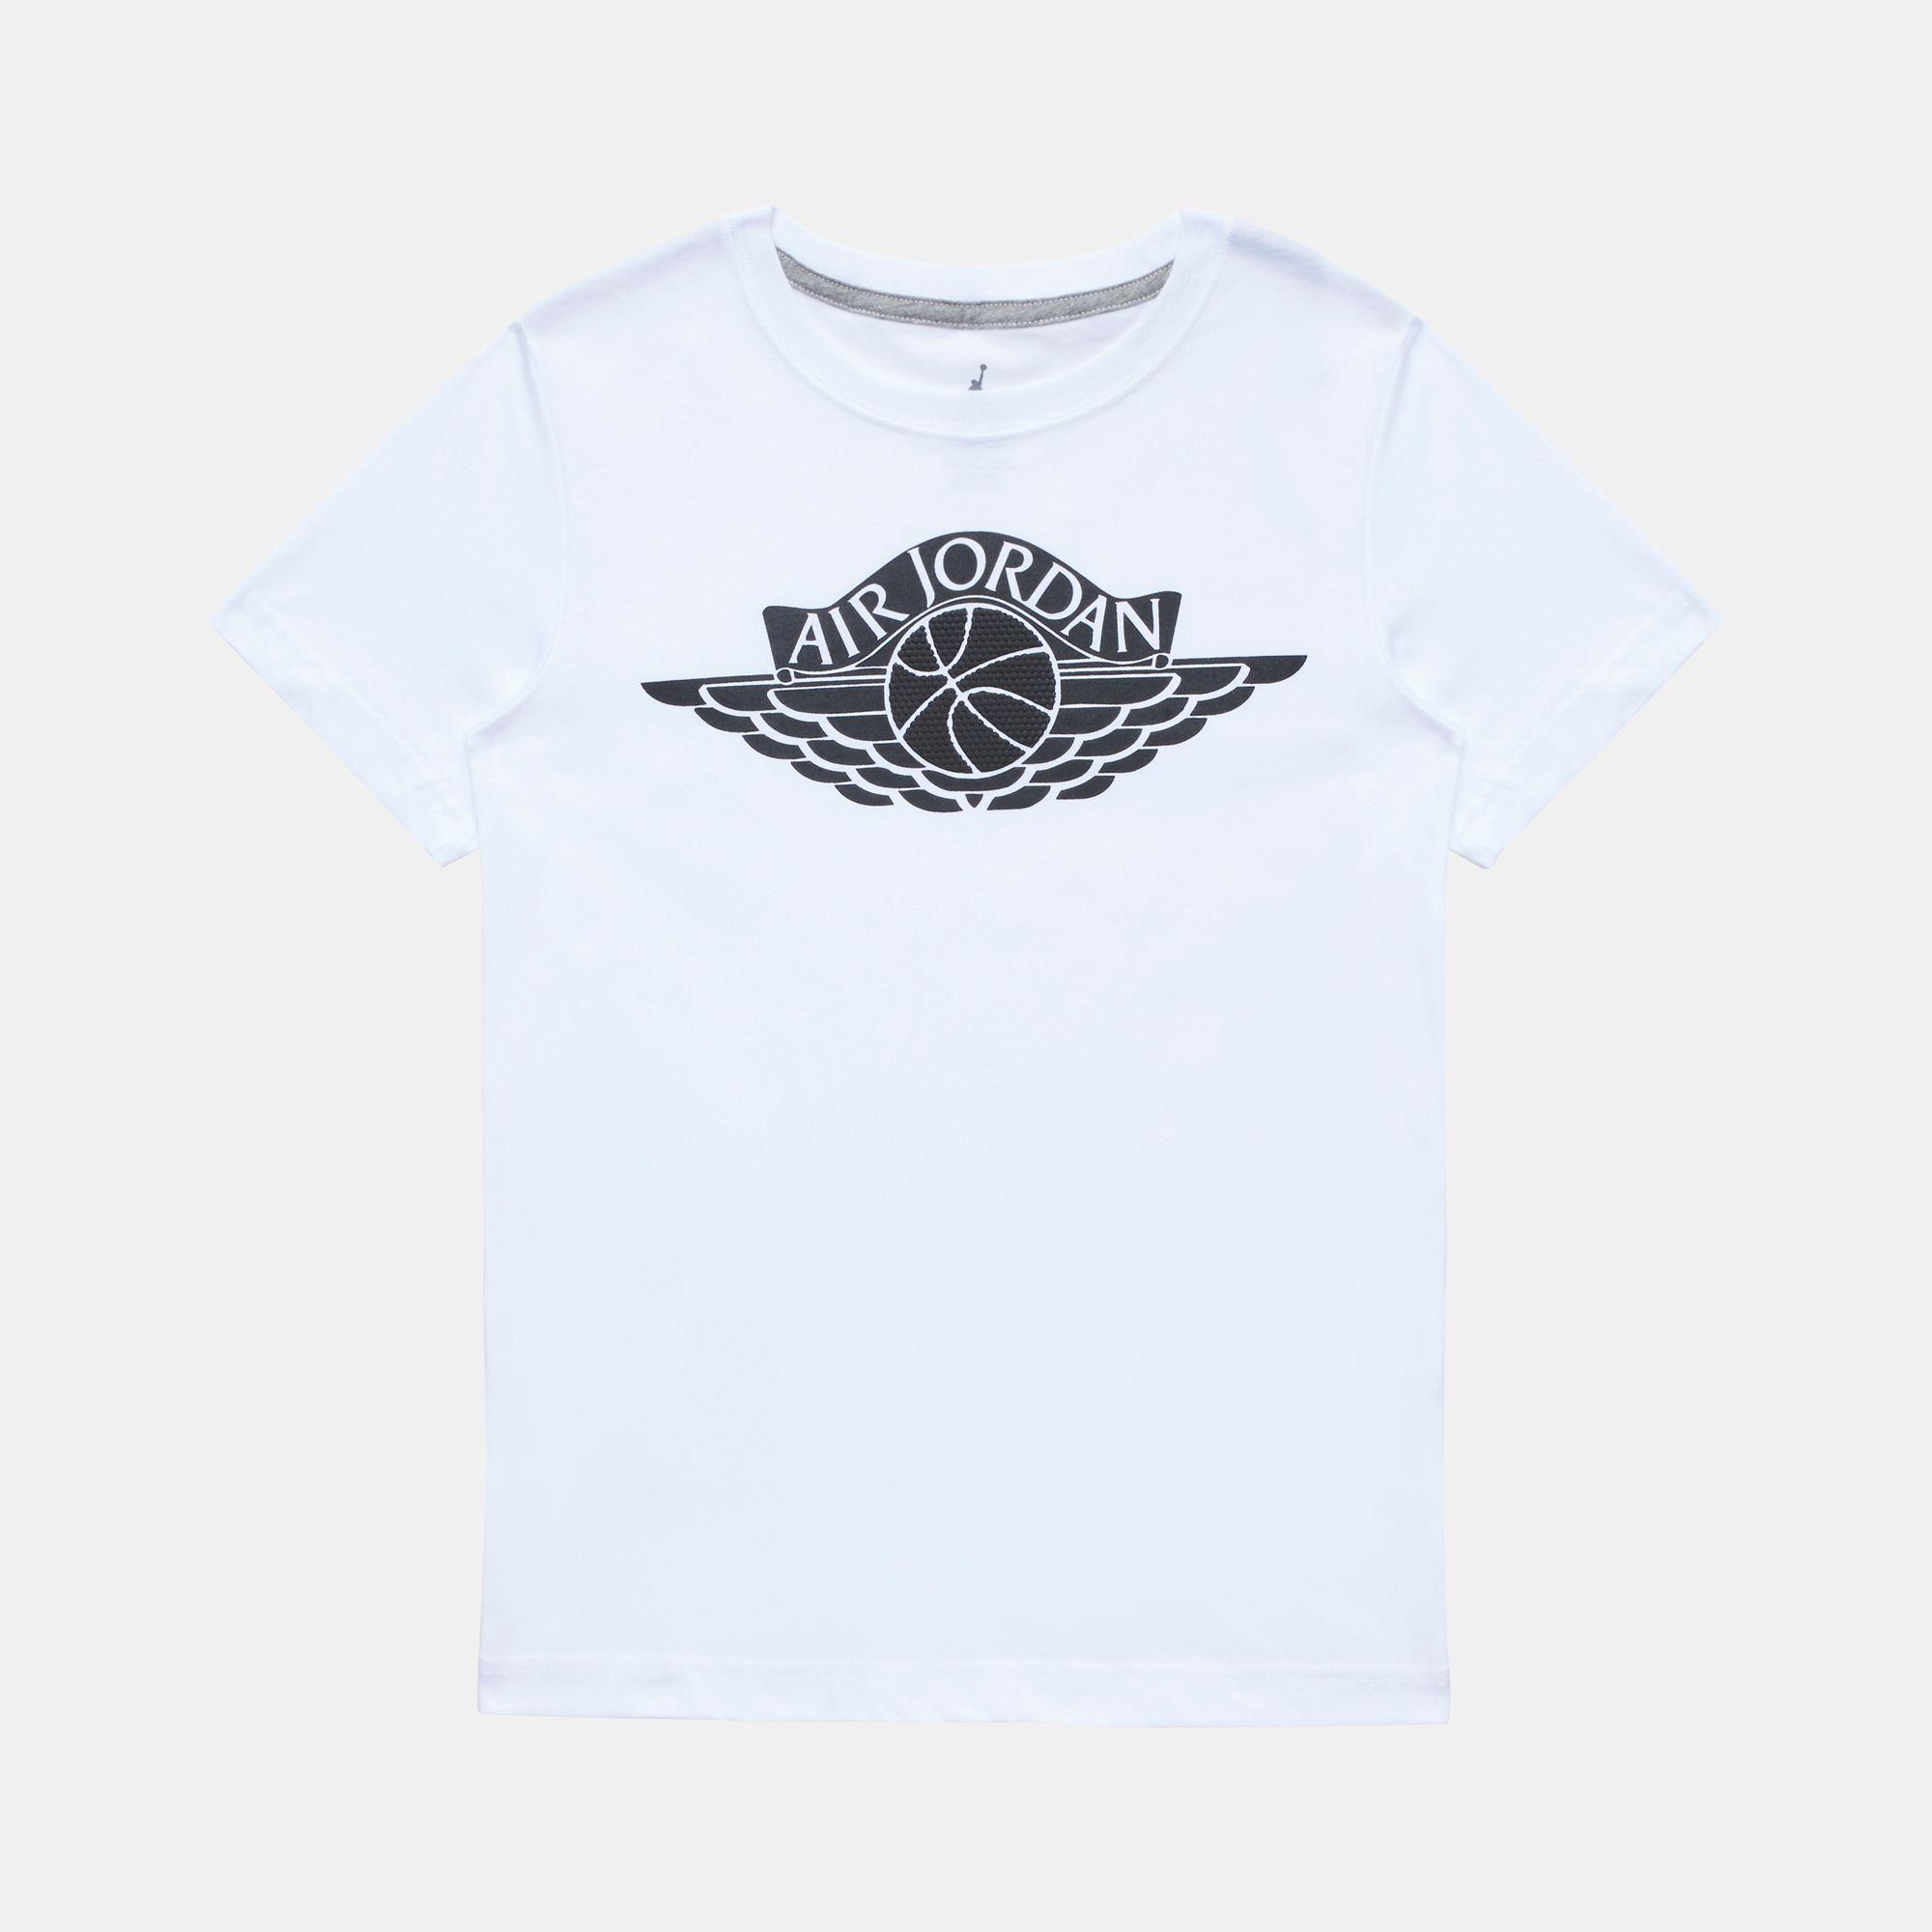 d42ef8e6ee0a Mens Jordan T Shirts On Sale – Rockwall Auction